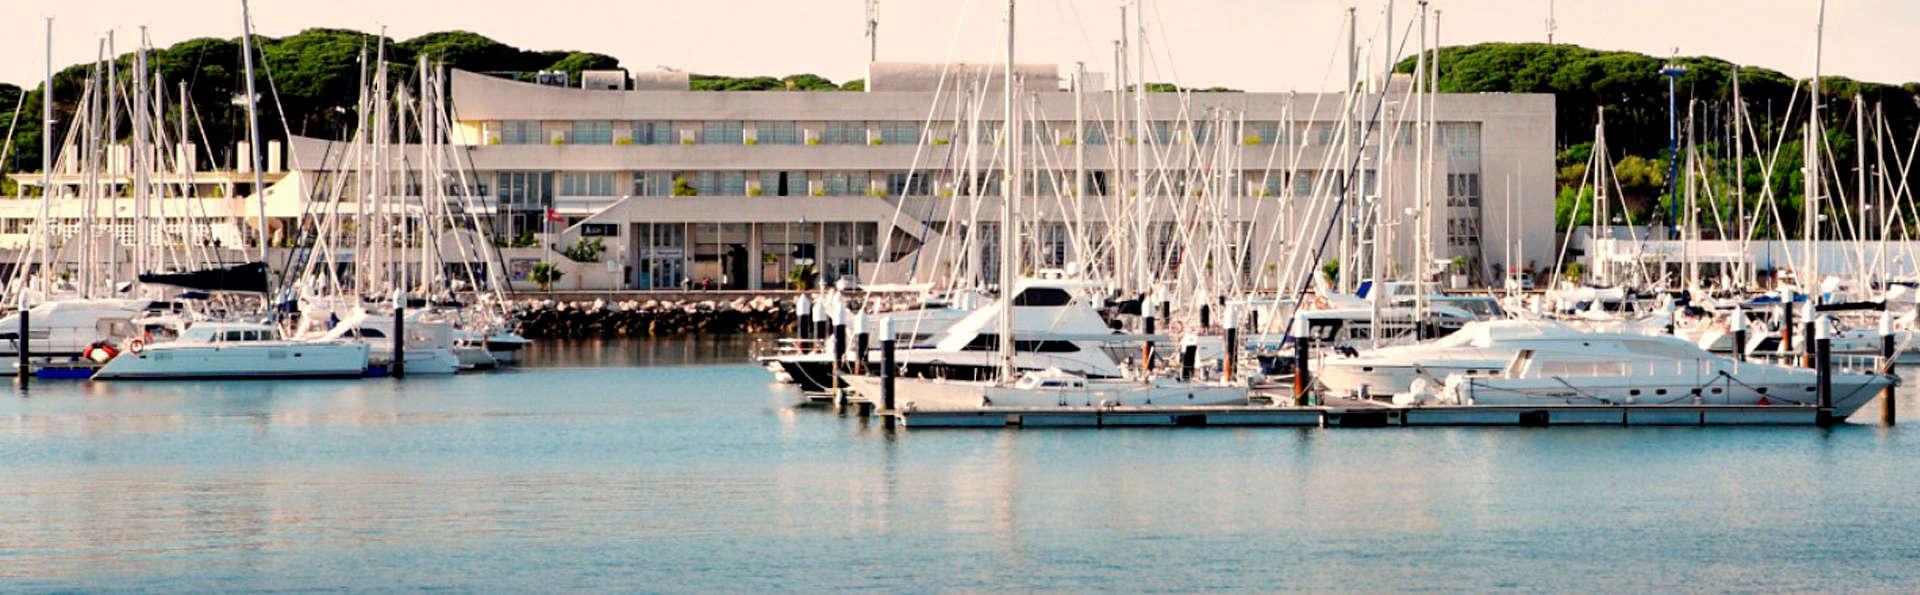 Hotel Puerto Sherry  - edit_front32.jpg